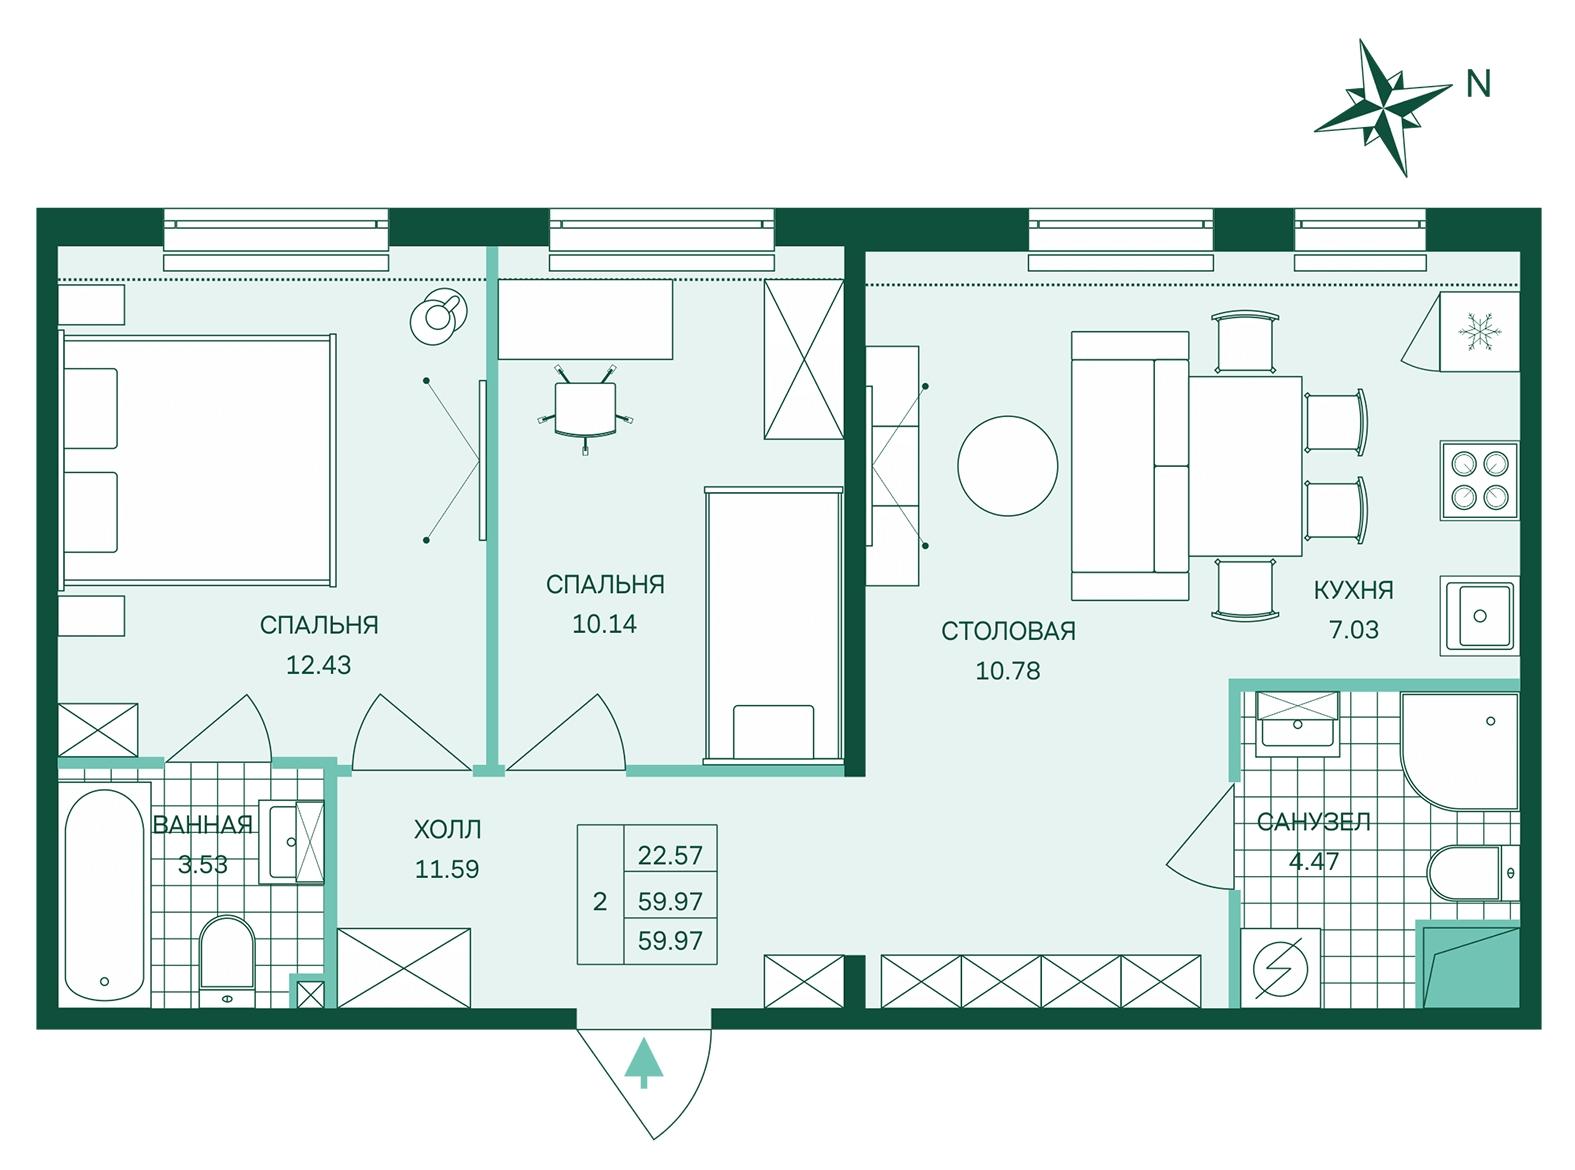 Планировка Трёхкомнатная квартира (Евро) площадью 59.97 кв.м в ЖК «Skandi Klubb»